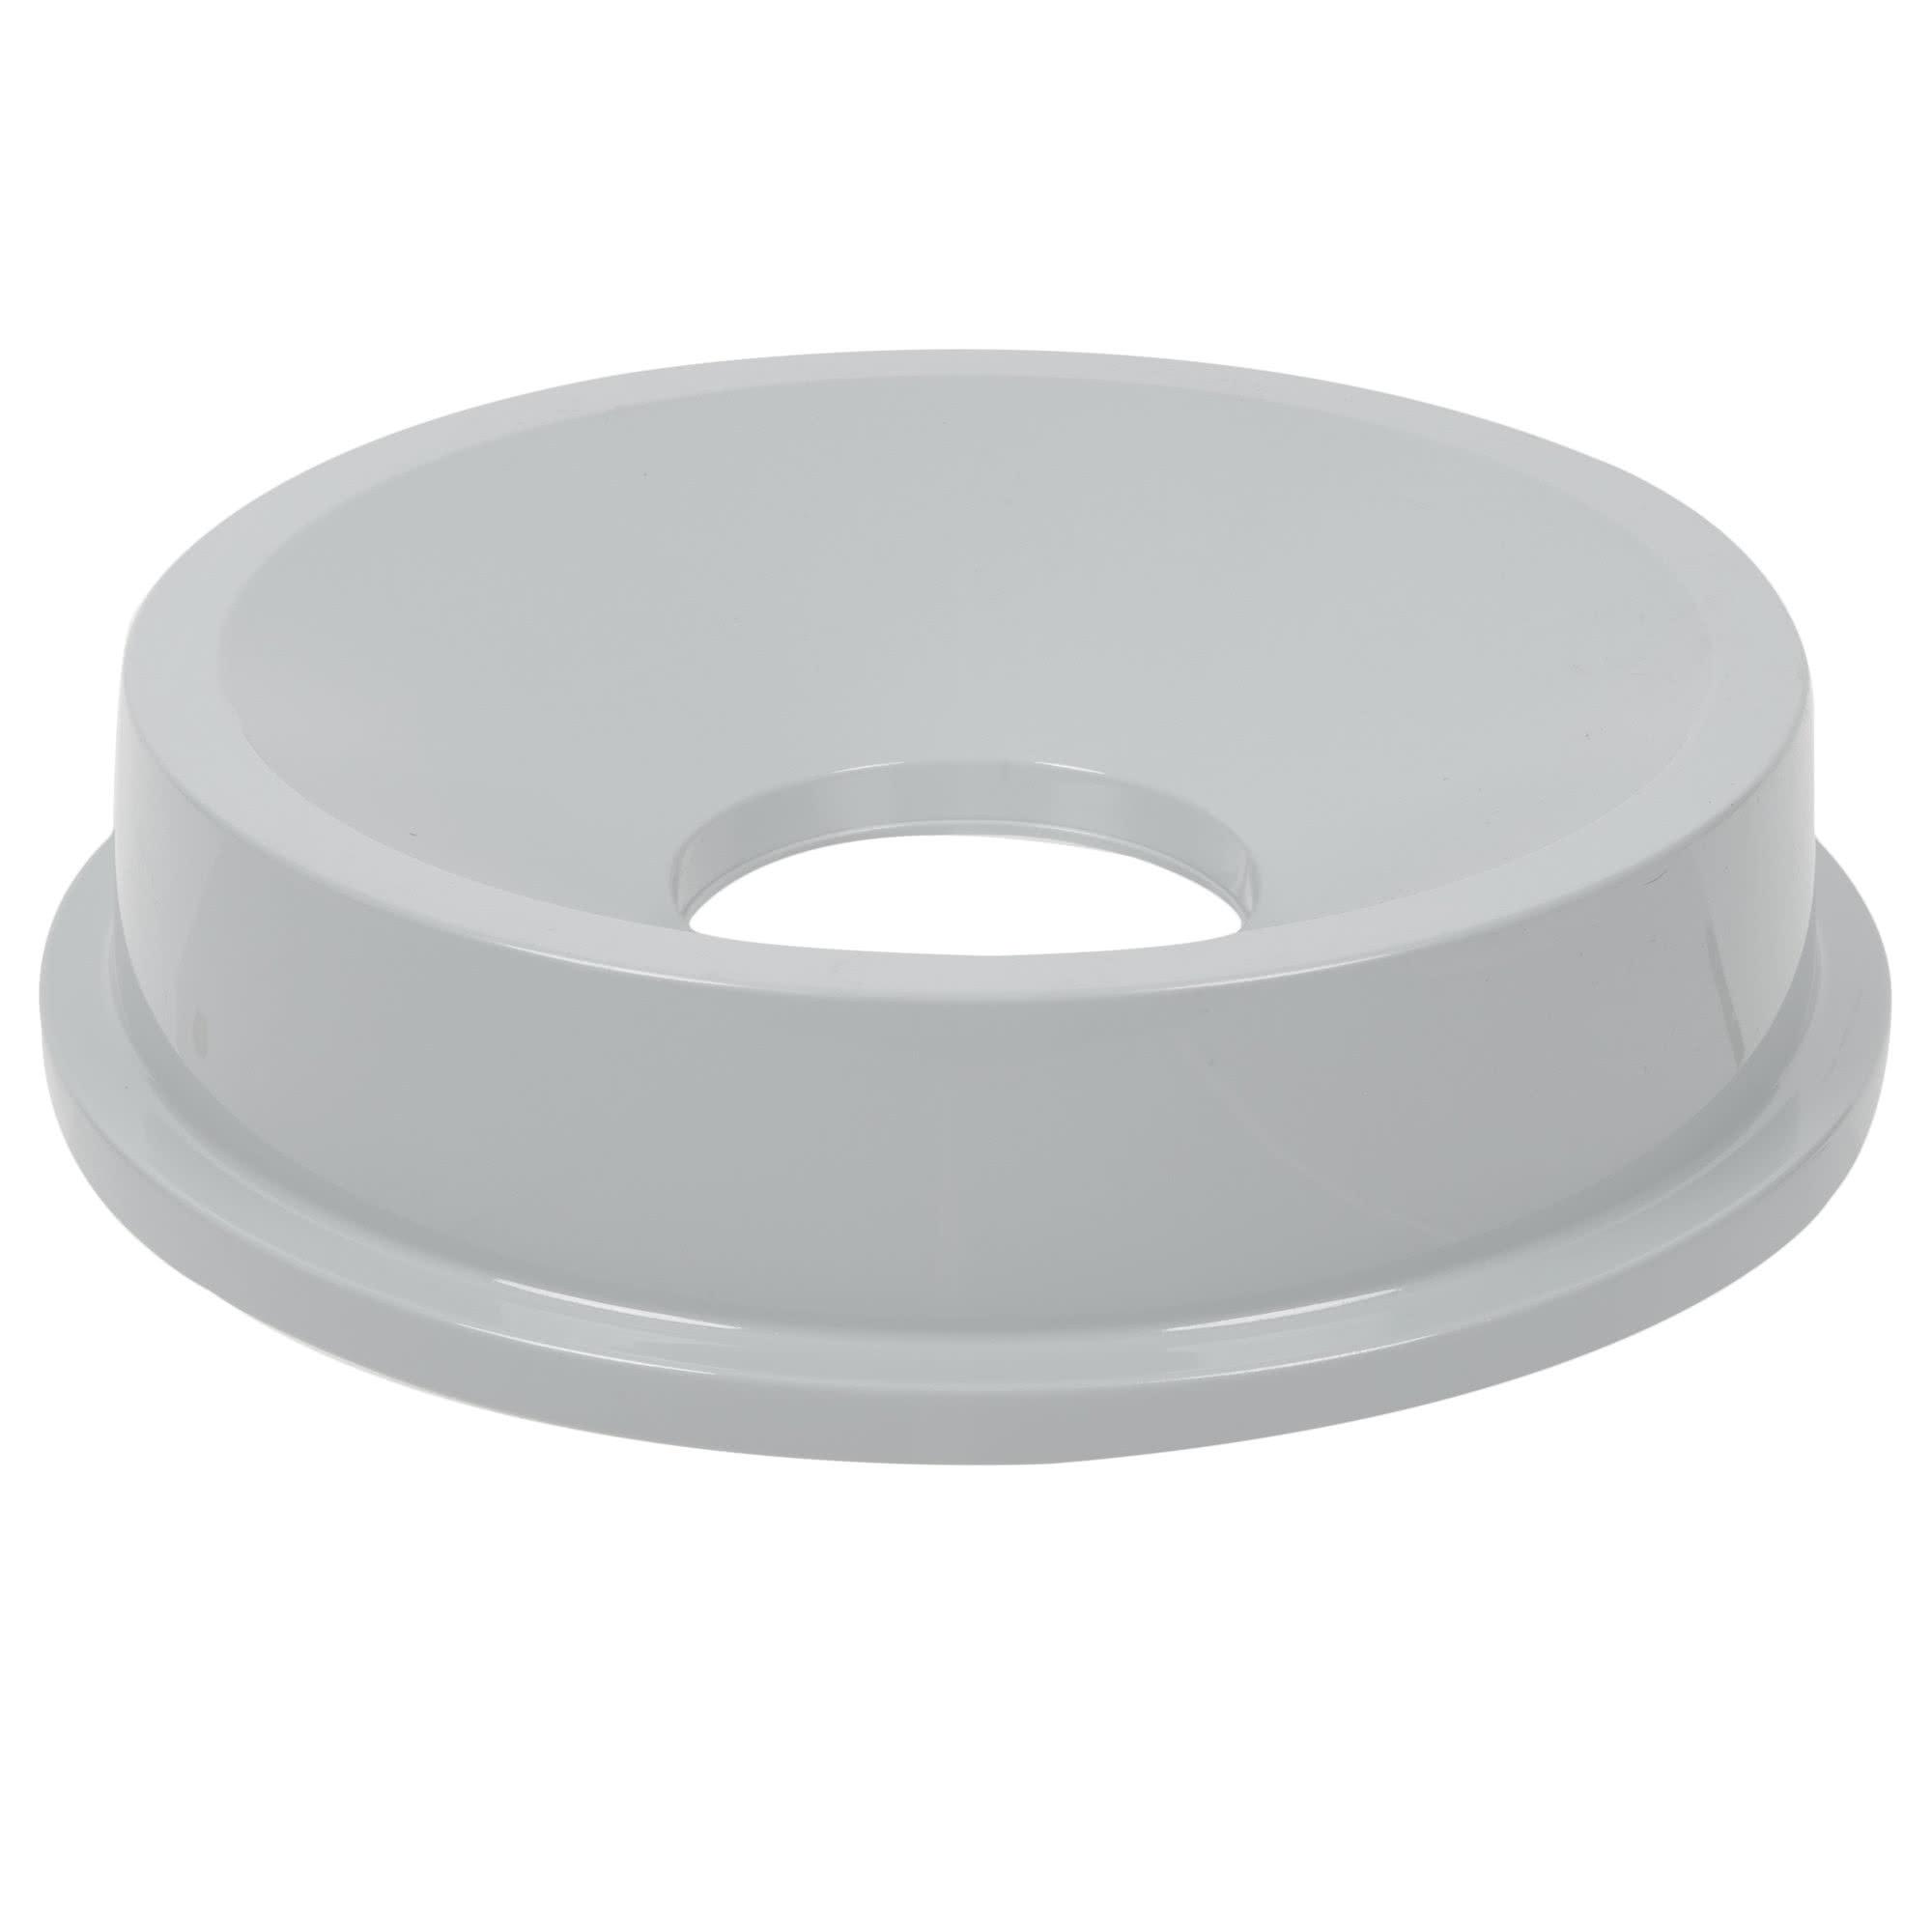 Rubbermaid FG354800GRAY tapa untouchable color gris round funnel top, aplican contenedores FG294700 y FG354600 1